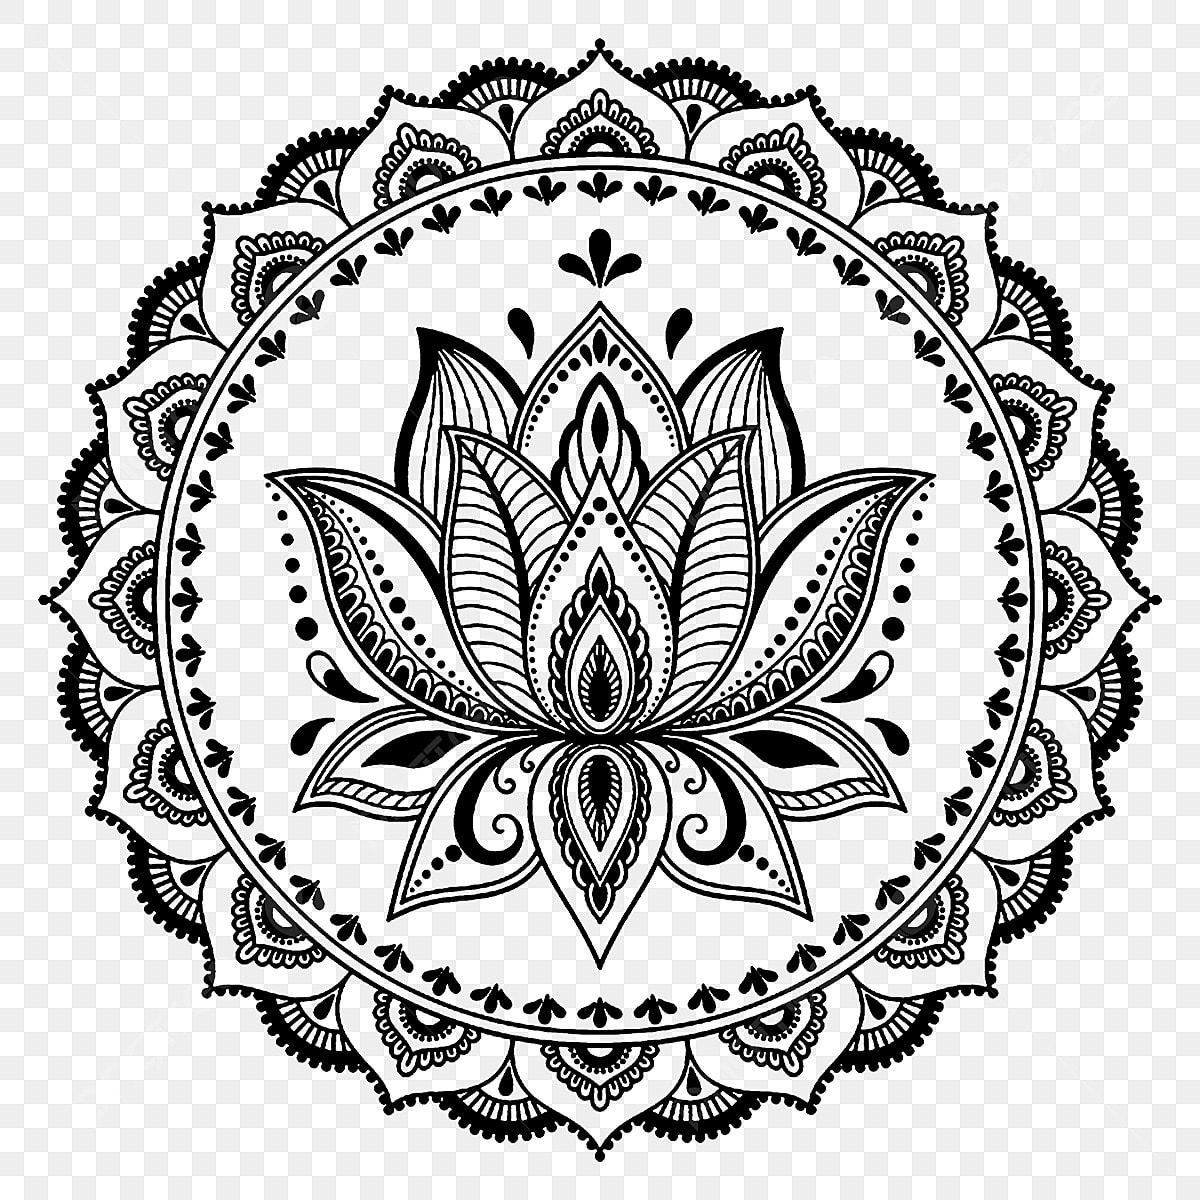 Lostus Flower Tattoovectorartworkfloral Lotus Flowertattoo